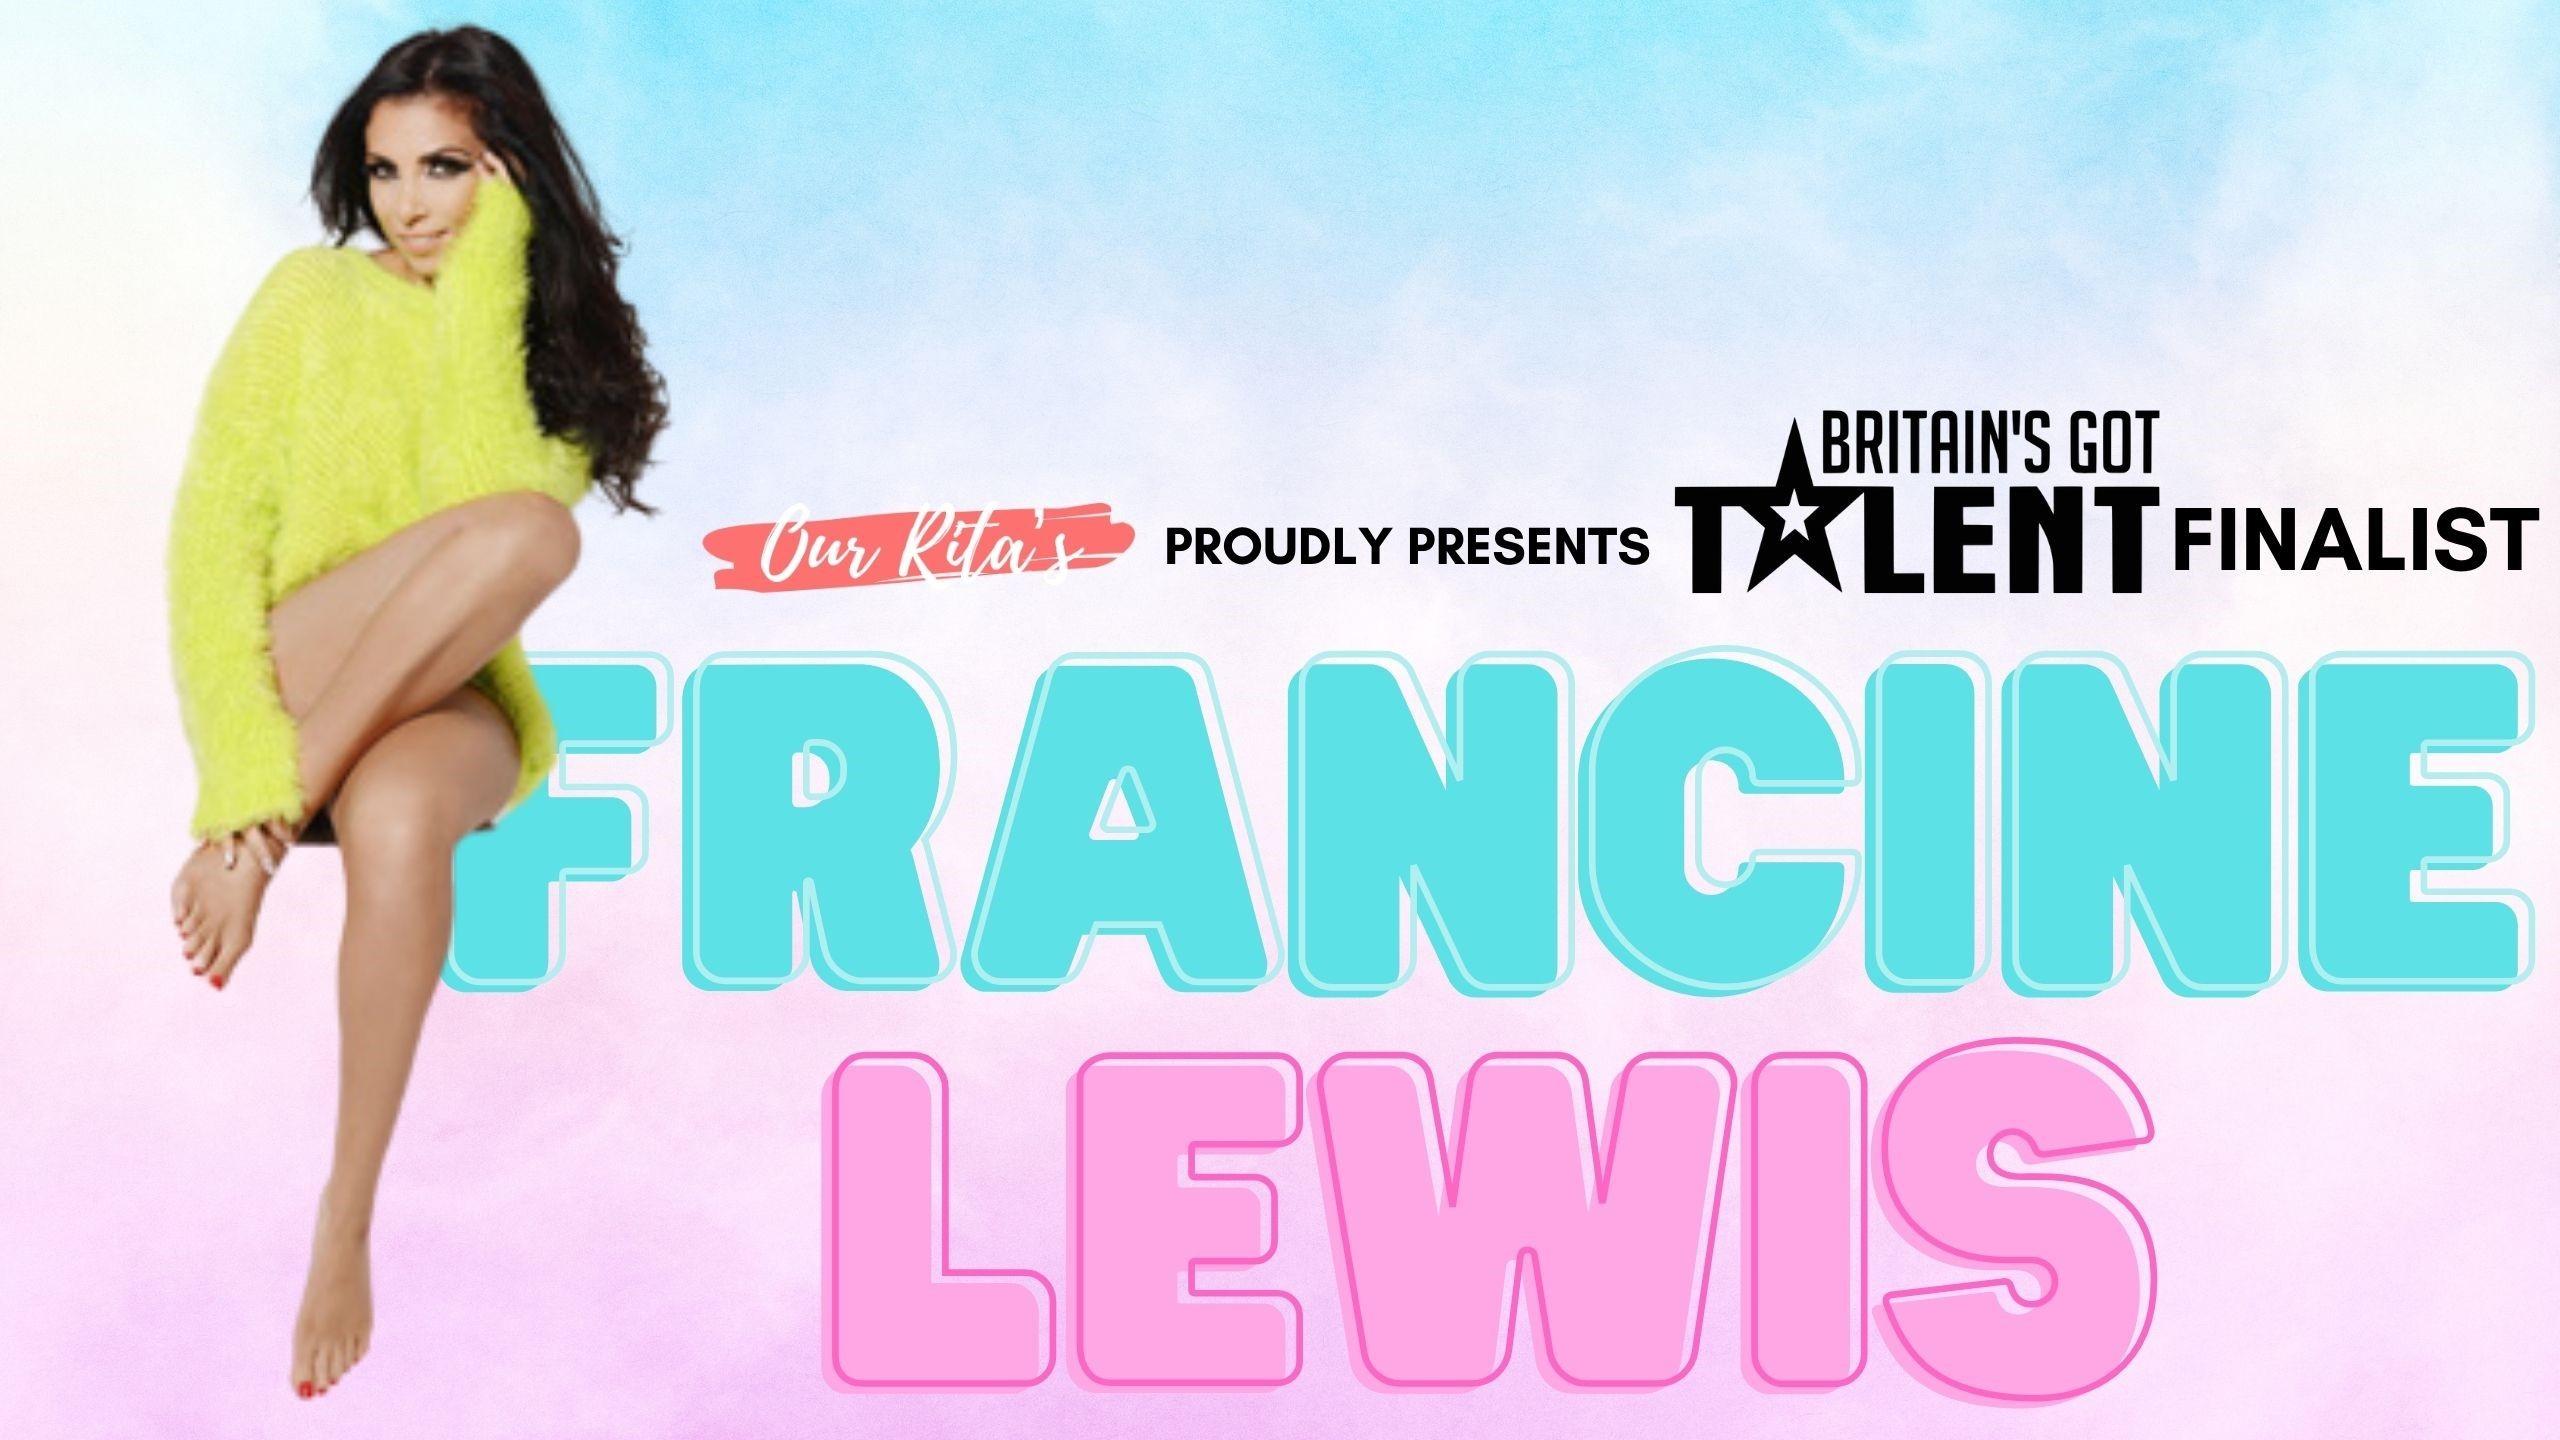 Our Rita's Live LTD Proudly Presents Francine Lewis: Impression